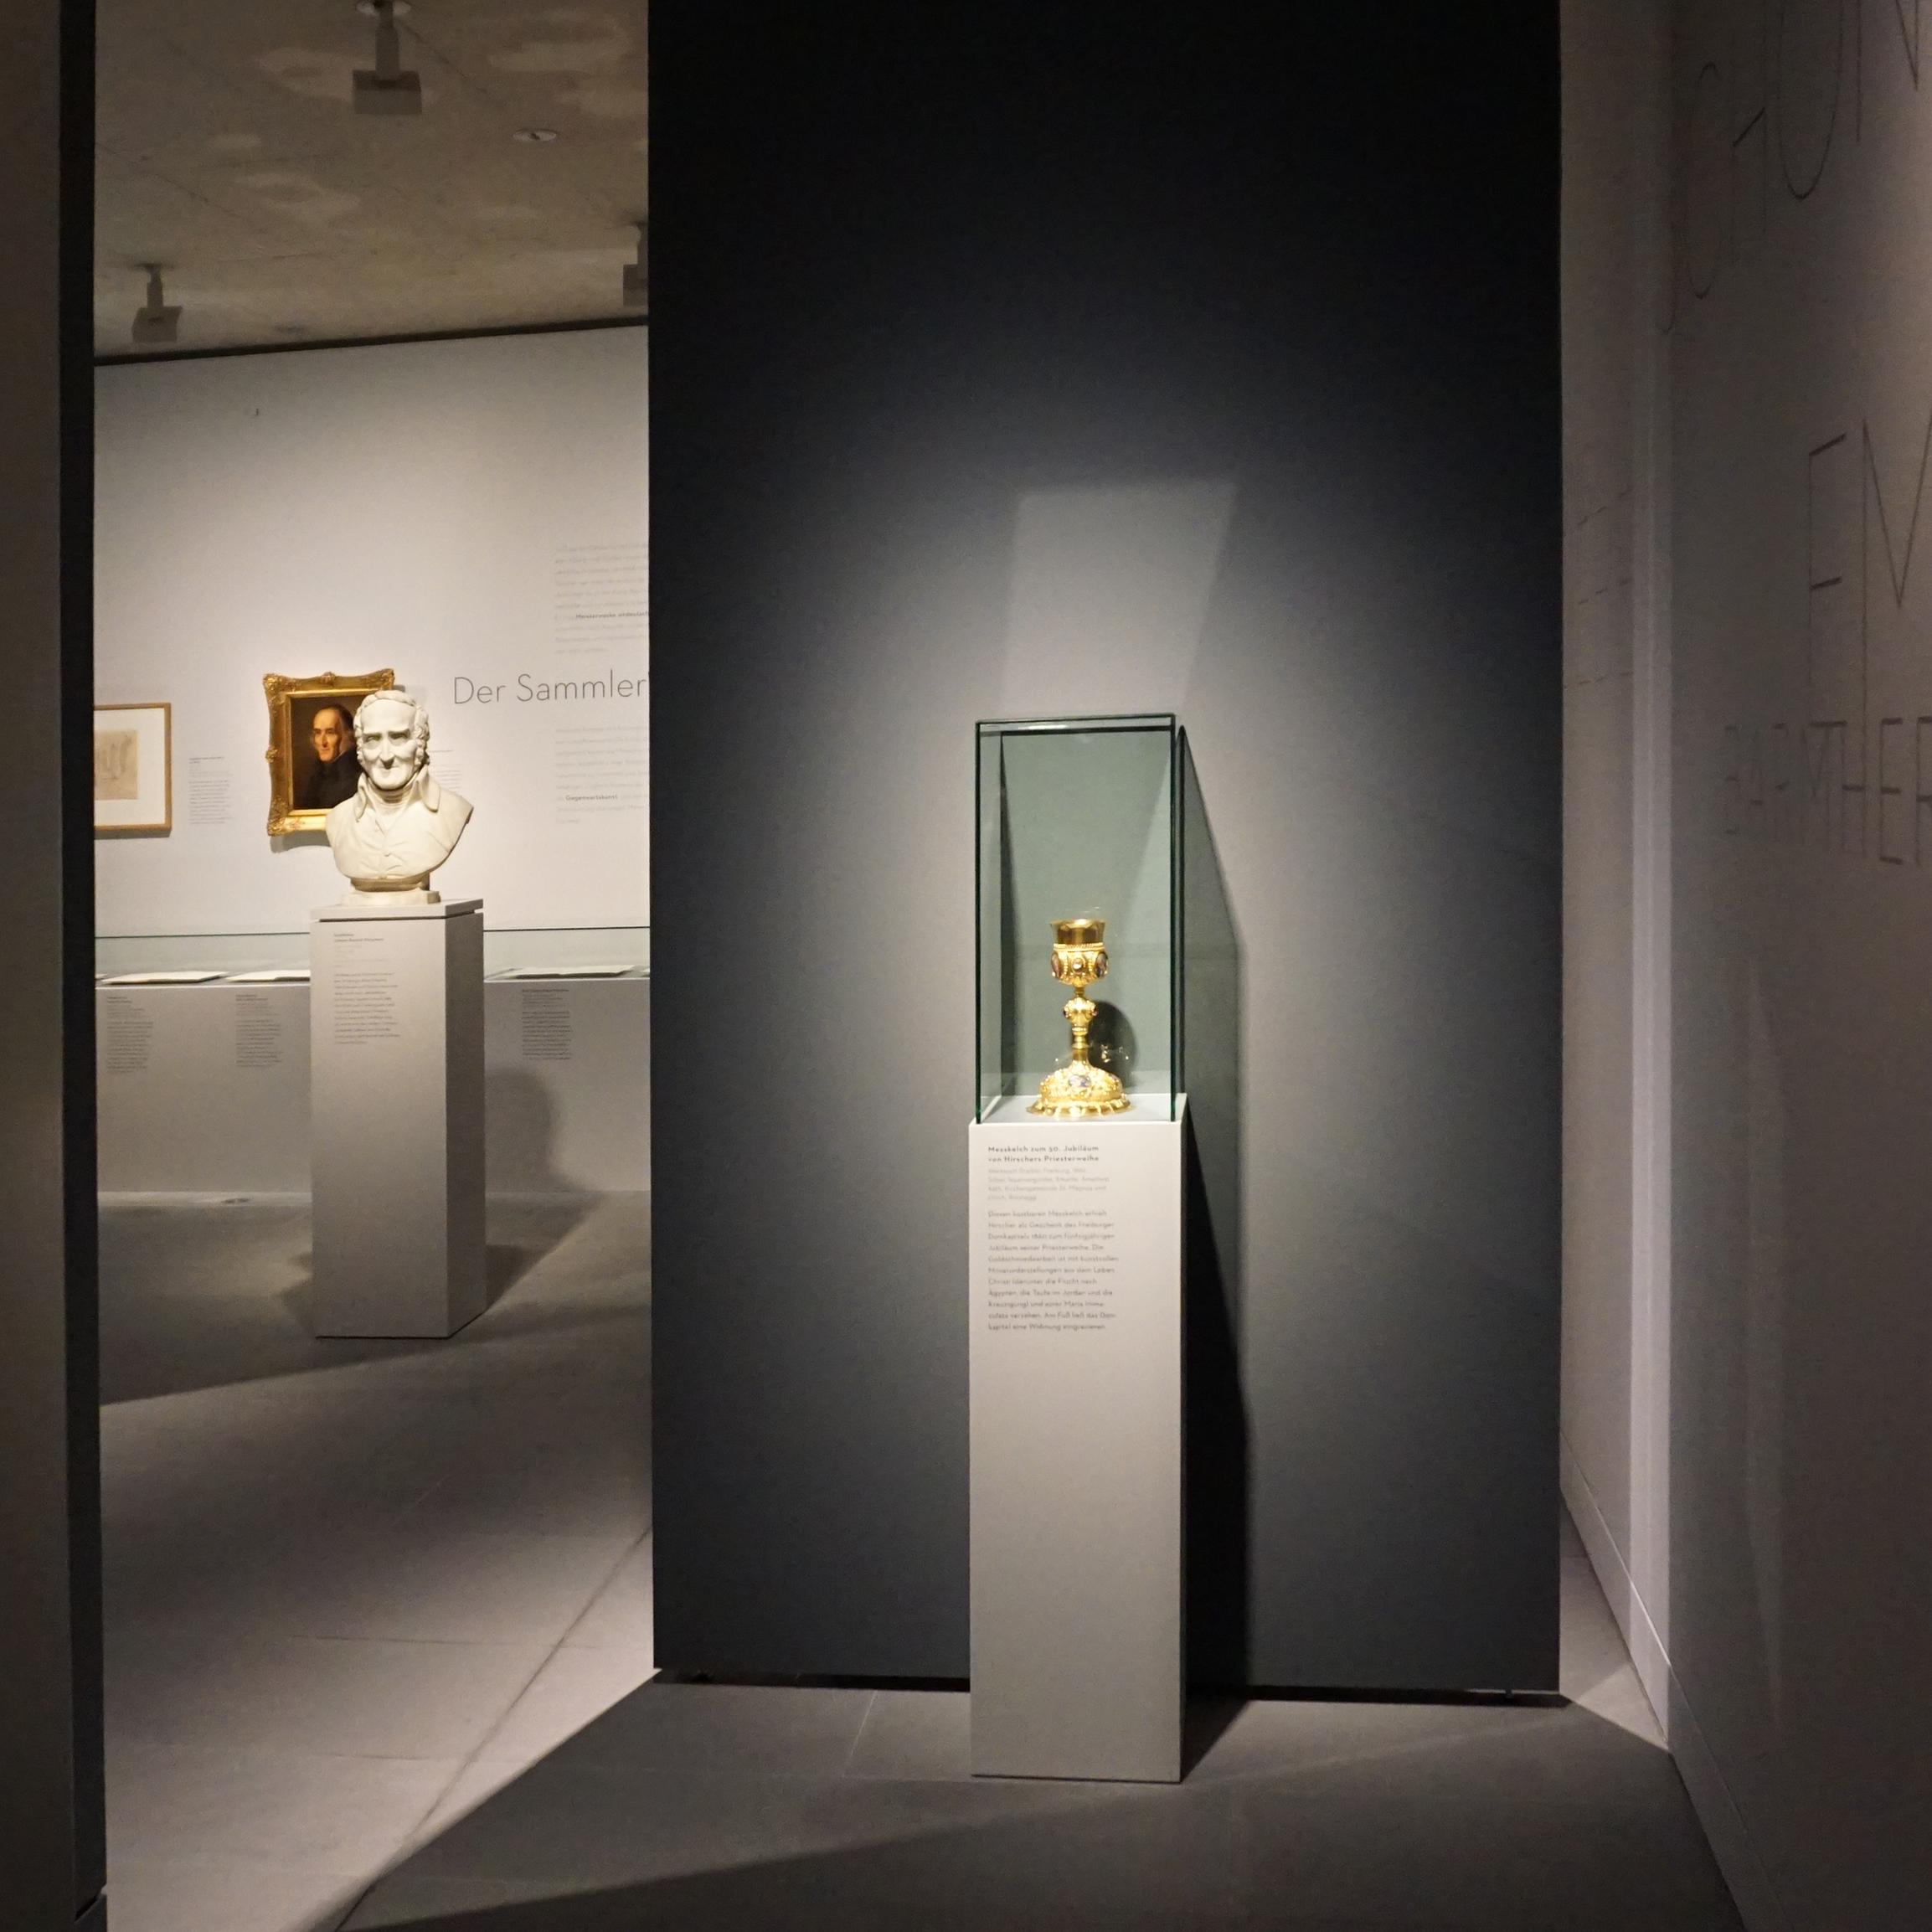 Demirag-Architekten-Diözesan-museum-johann-baptist-hirscher-glaube-kunst-hingabe-eroeffnung-03.jpg